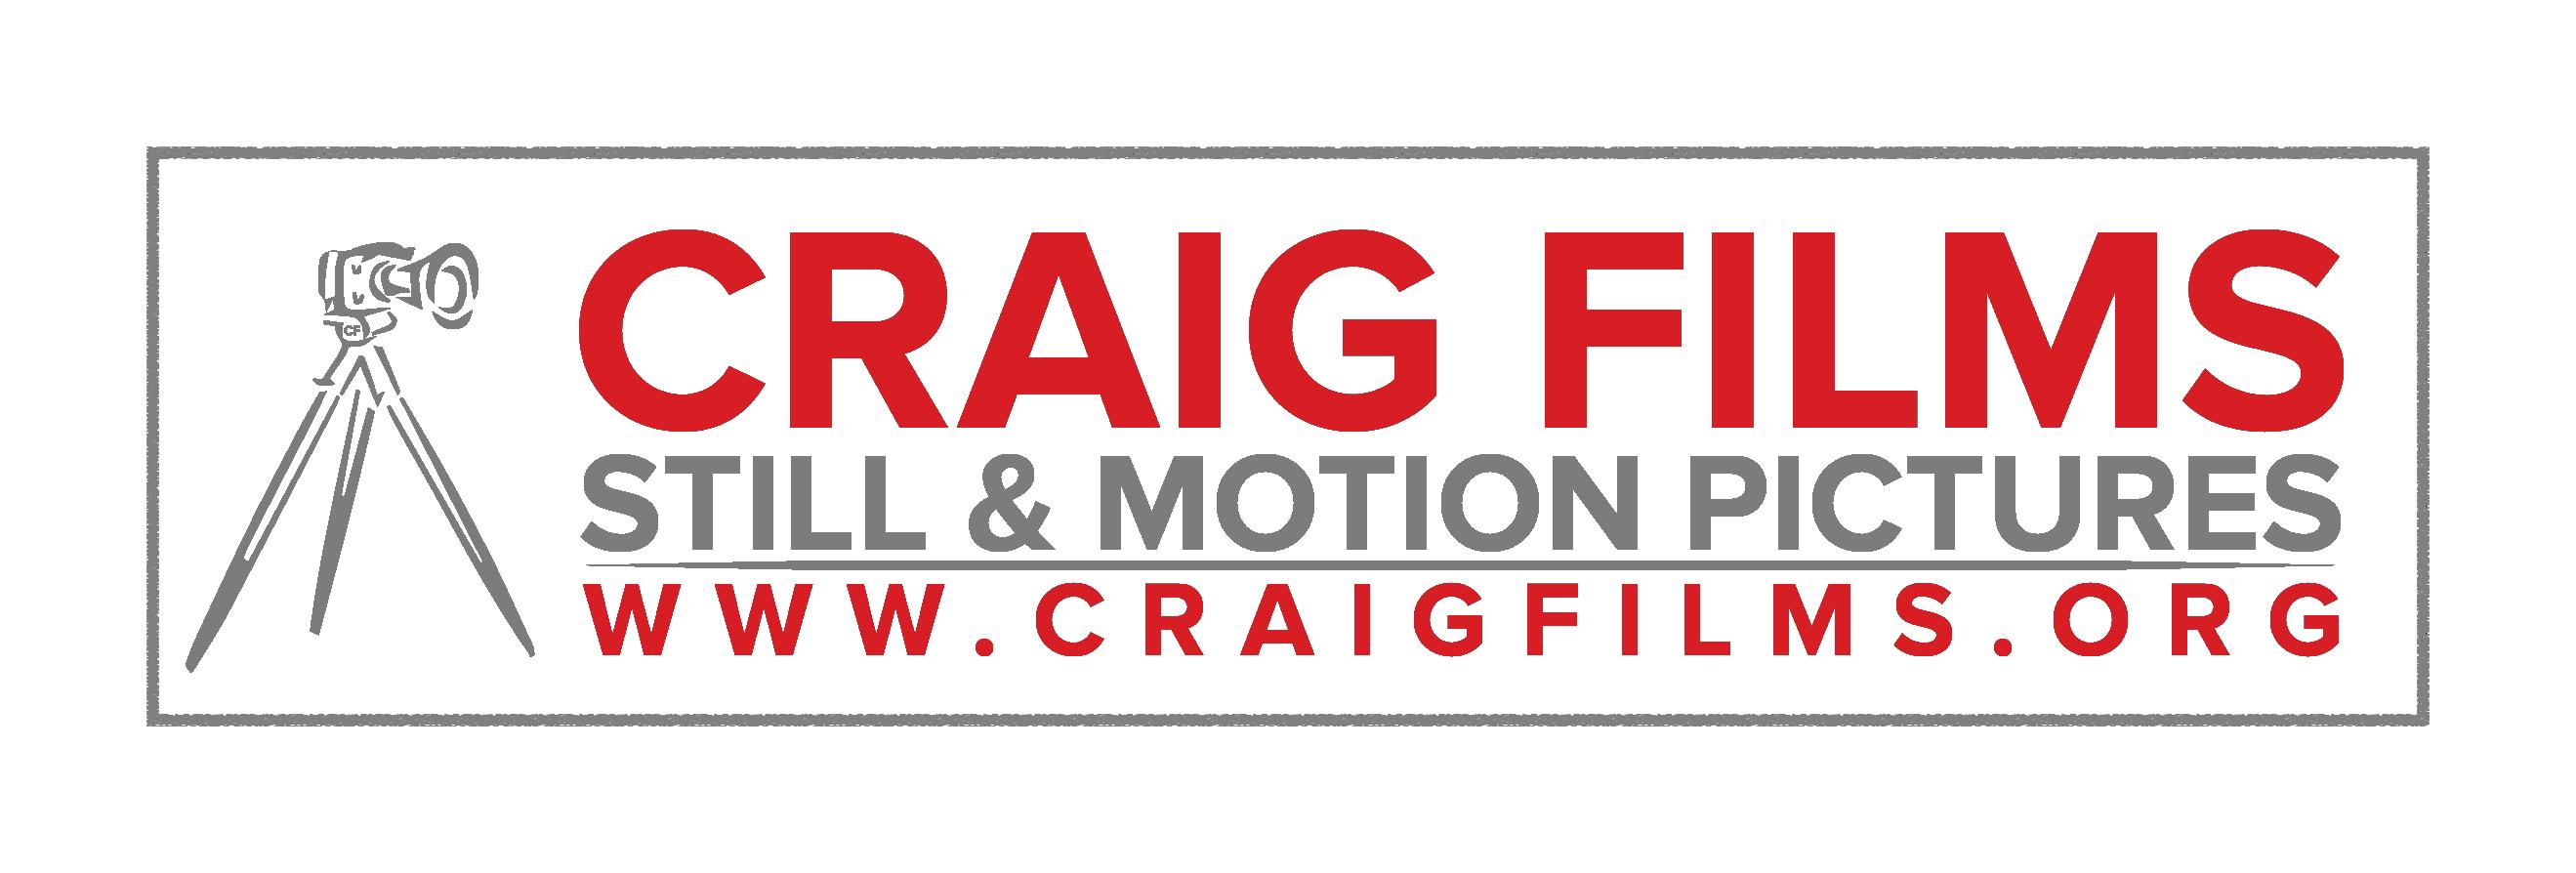 Craig Films L.C.